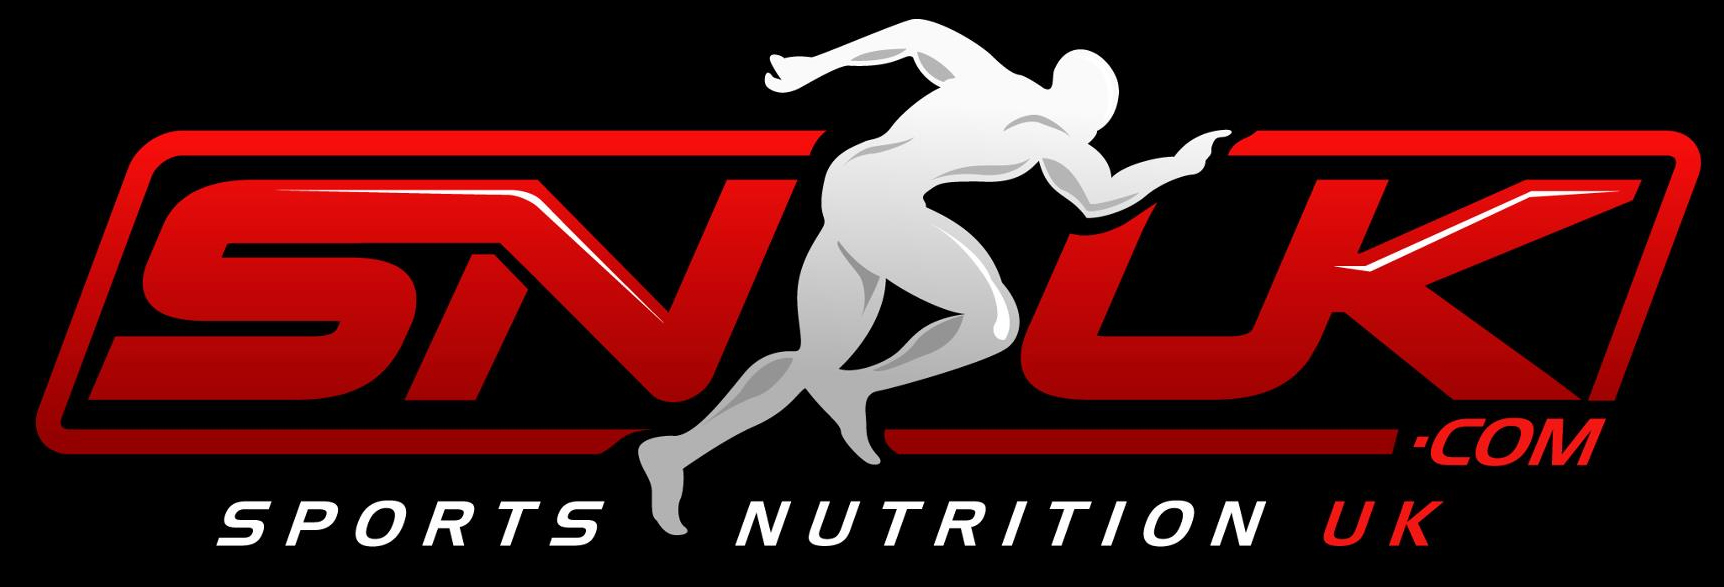 bodybuilding supplements contain steroids